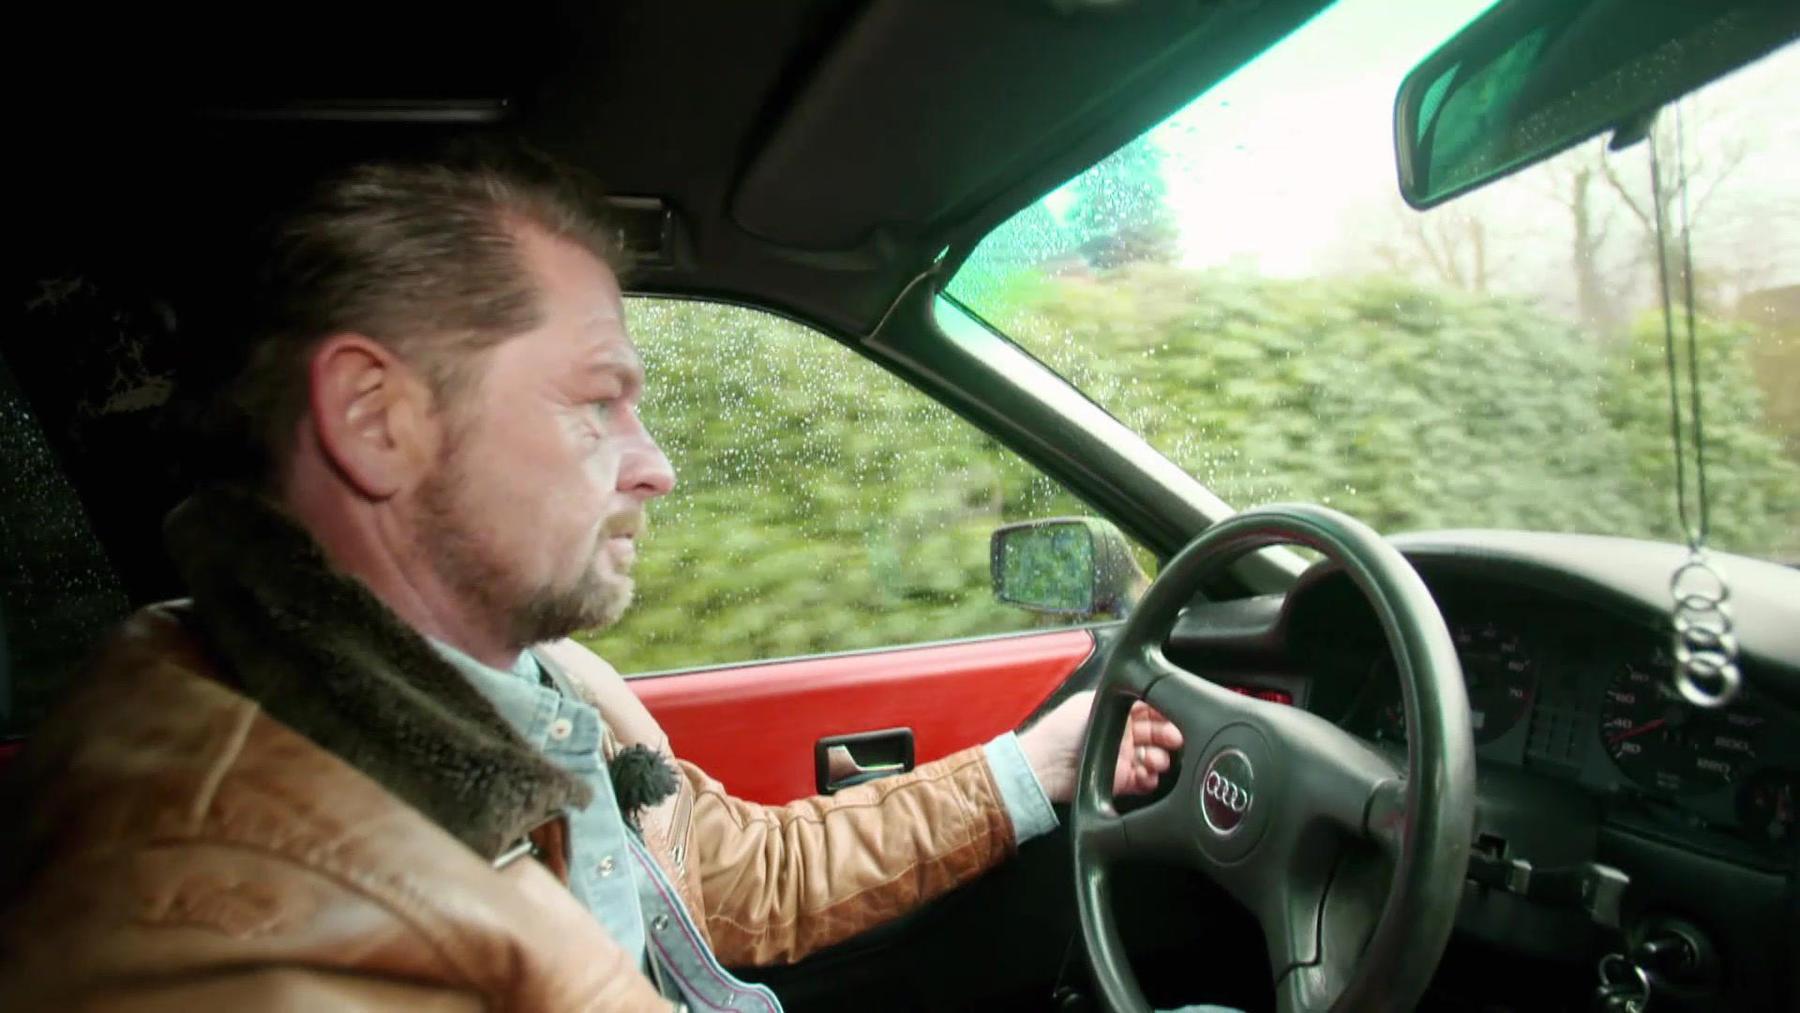 Det sucht Youngtimer   Freds supergünstiger Kombi   GRIP-Elektro-Check - Honda e   Beschleunigungsmo